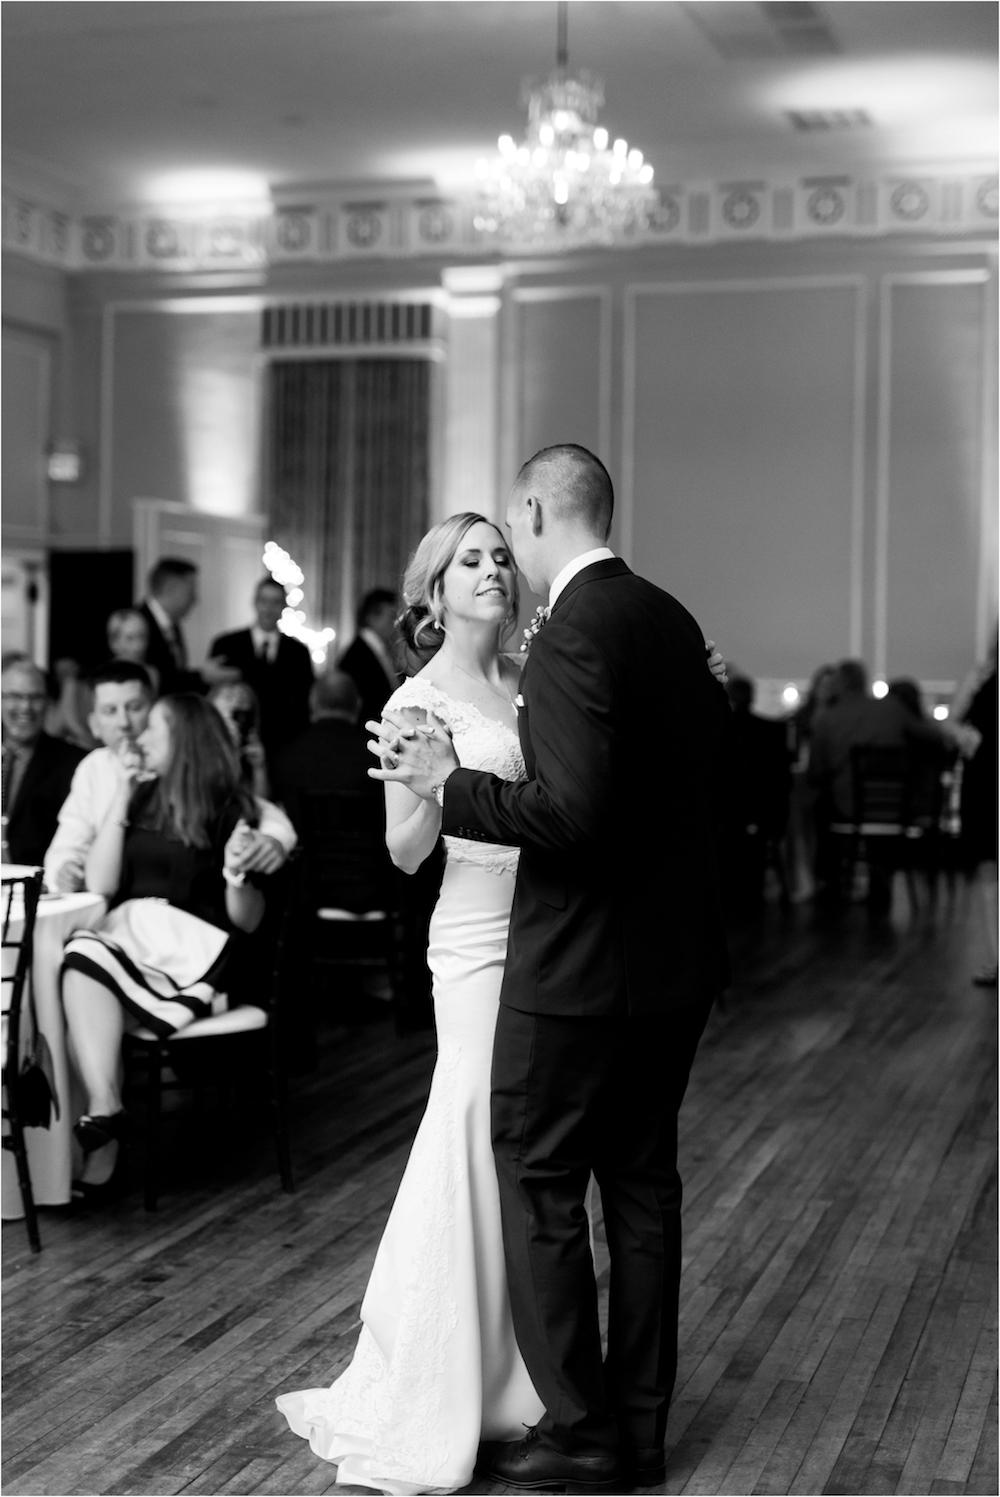 meeting-house-grand-ballroom-plymouth-michigan-wedding-photo-224.jpg